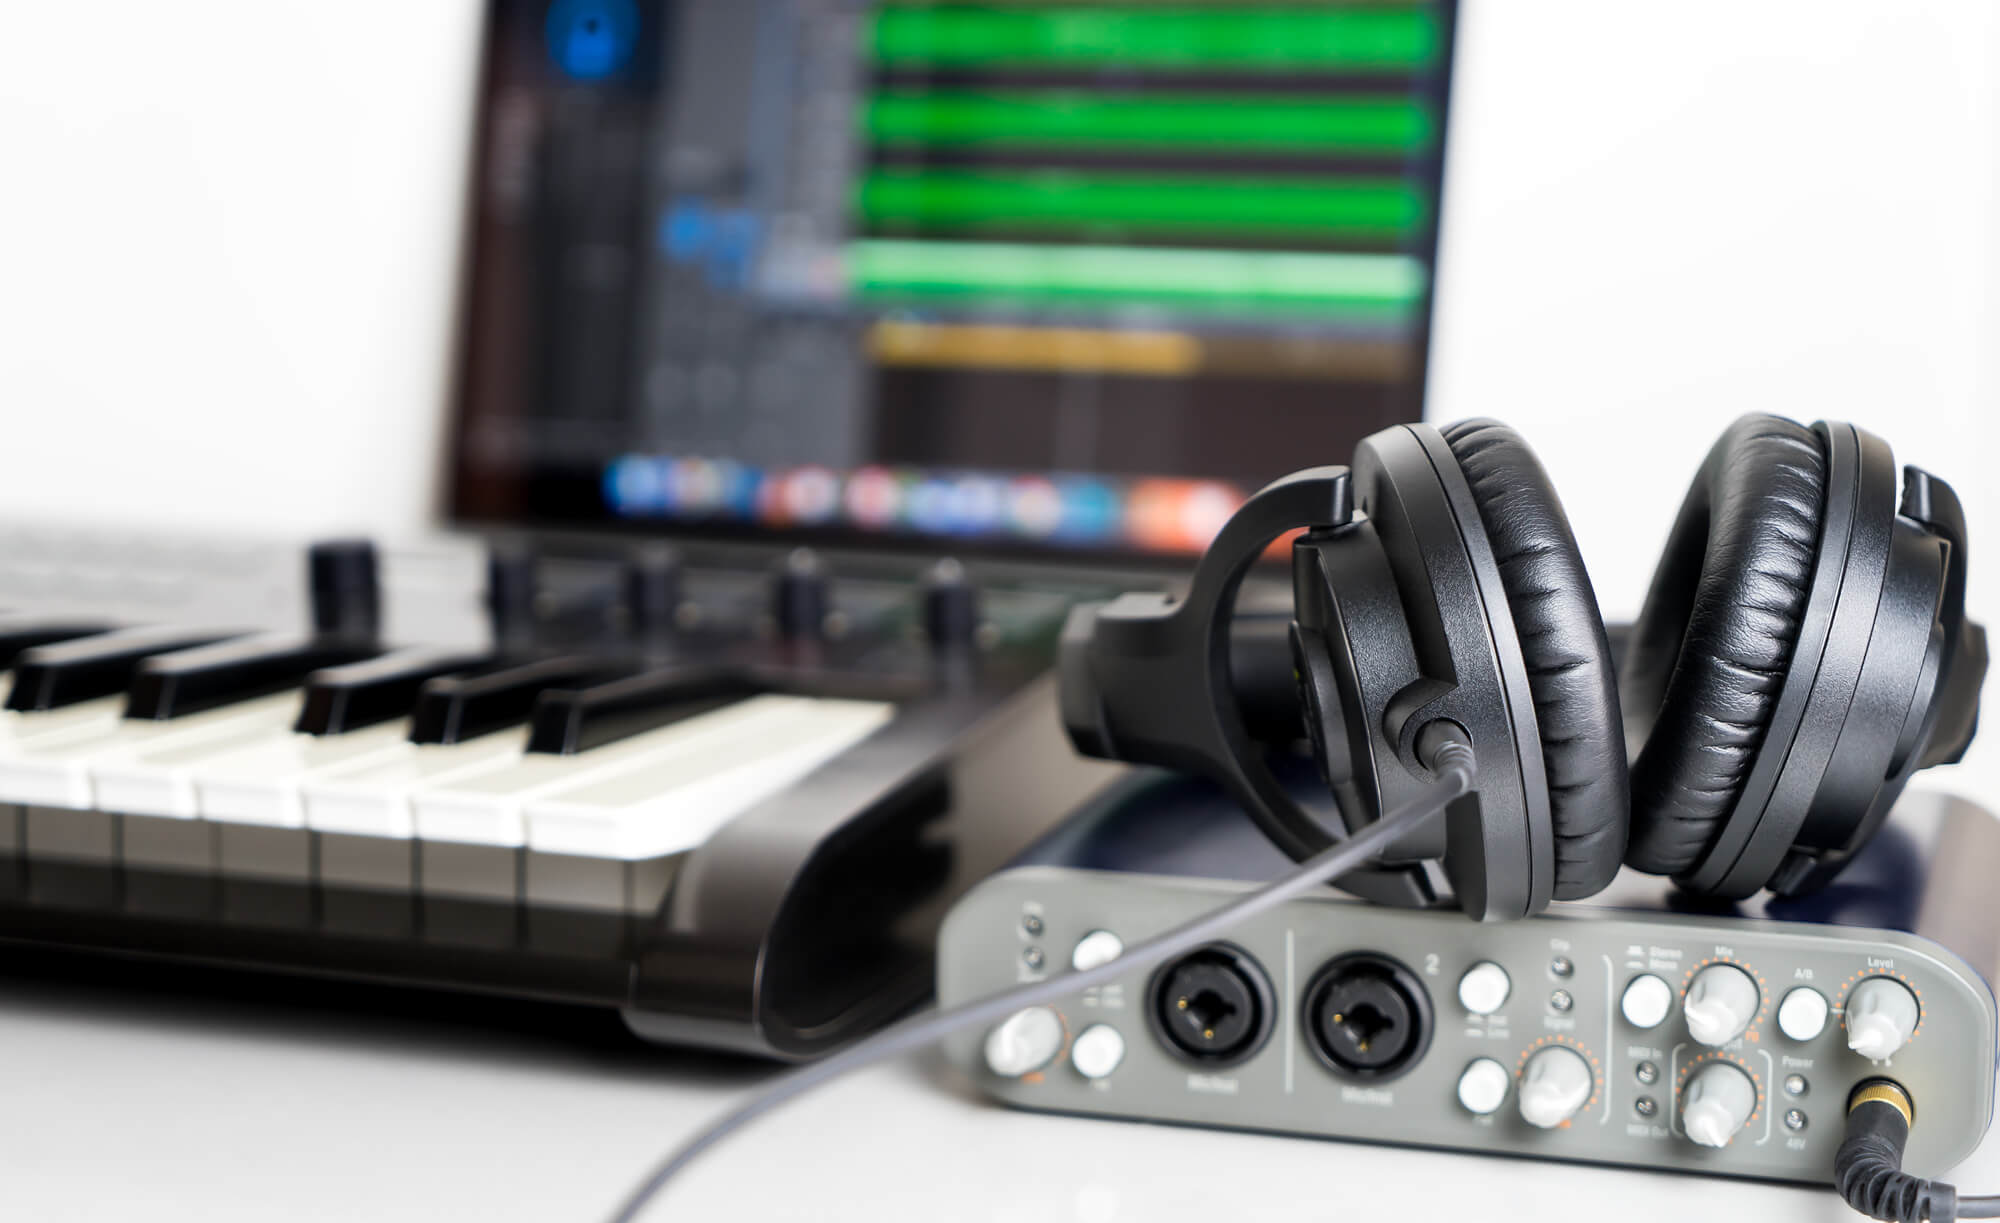 WEBコンテンツ制作に追い風!? PIXTAの音楽素材販売開始の背景にある市場とは